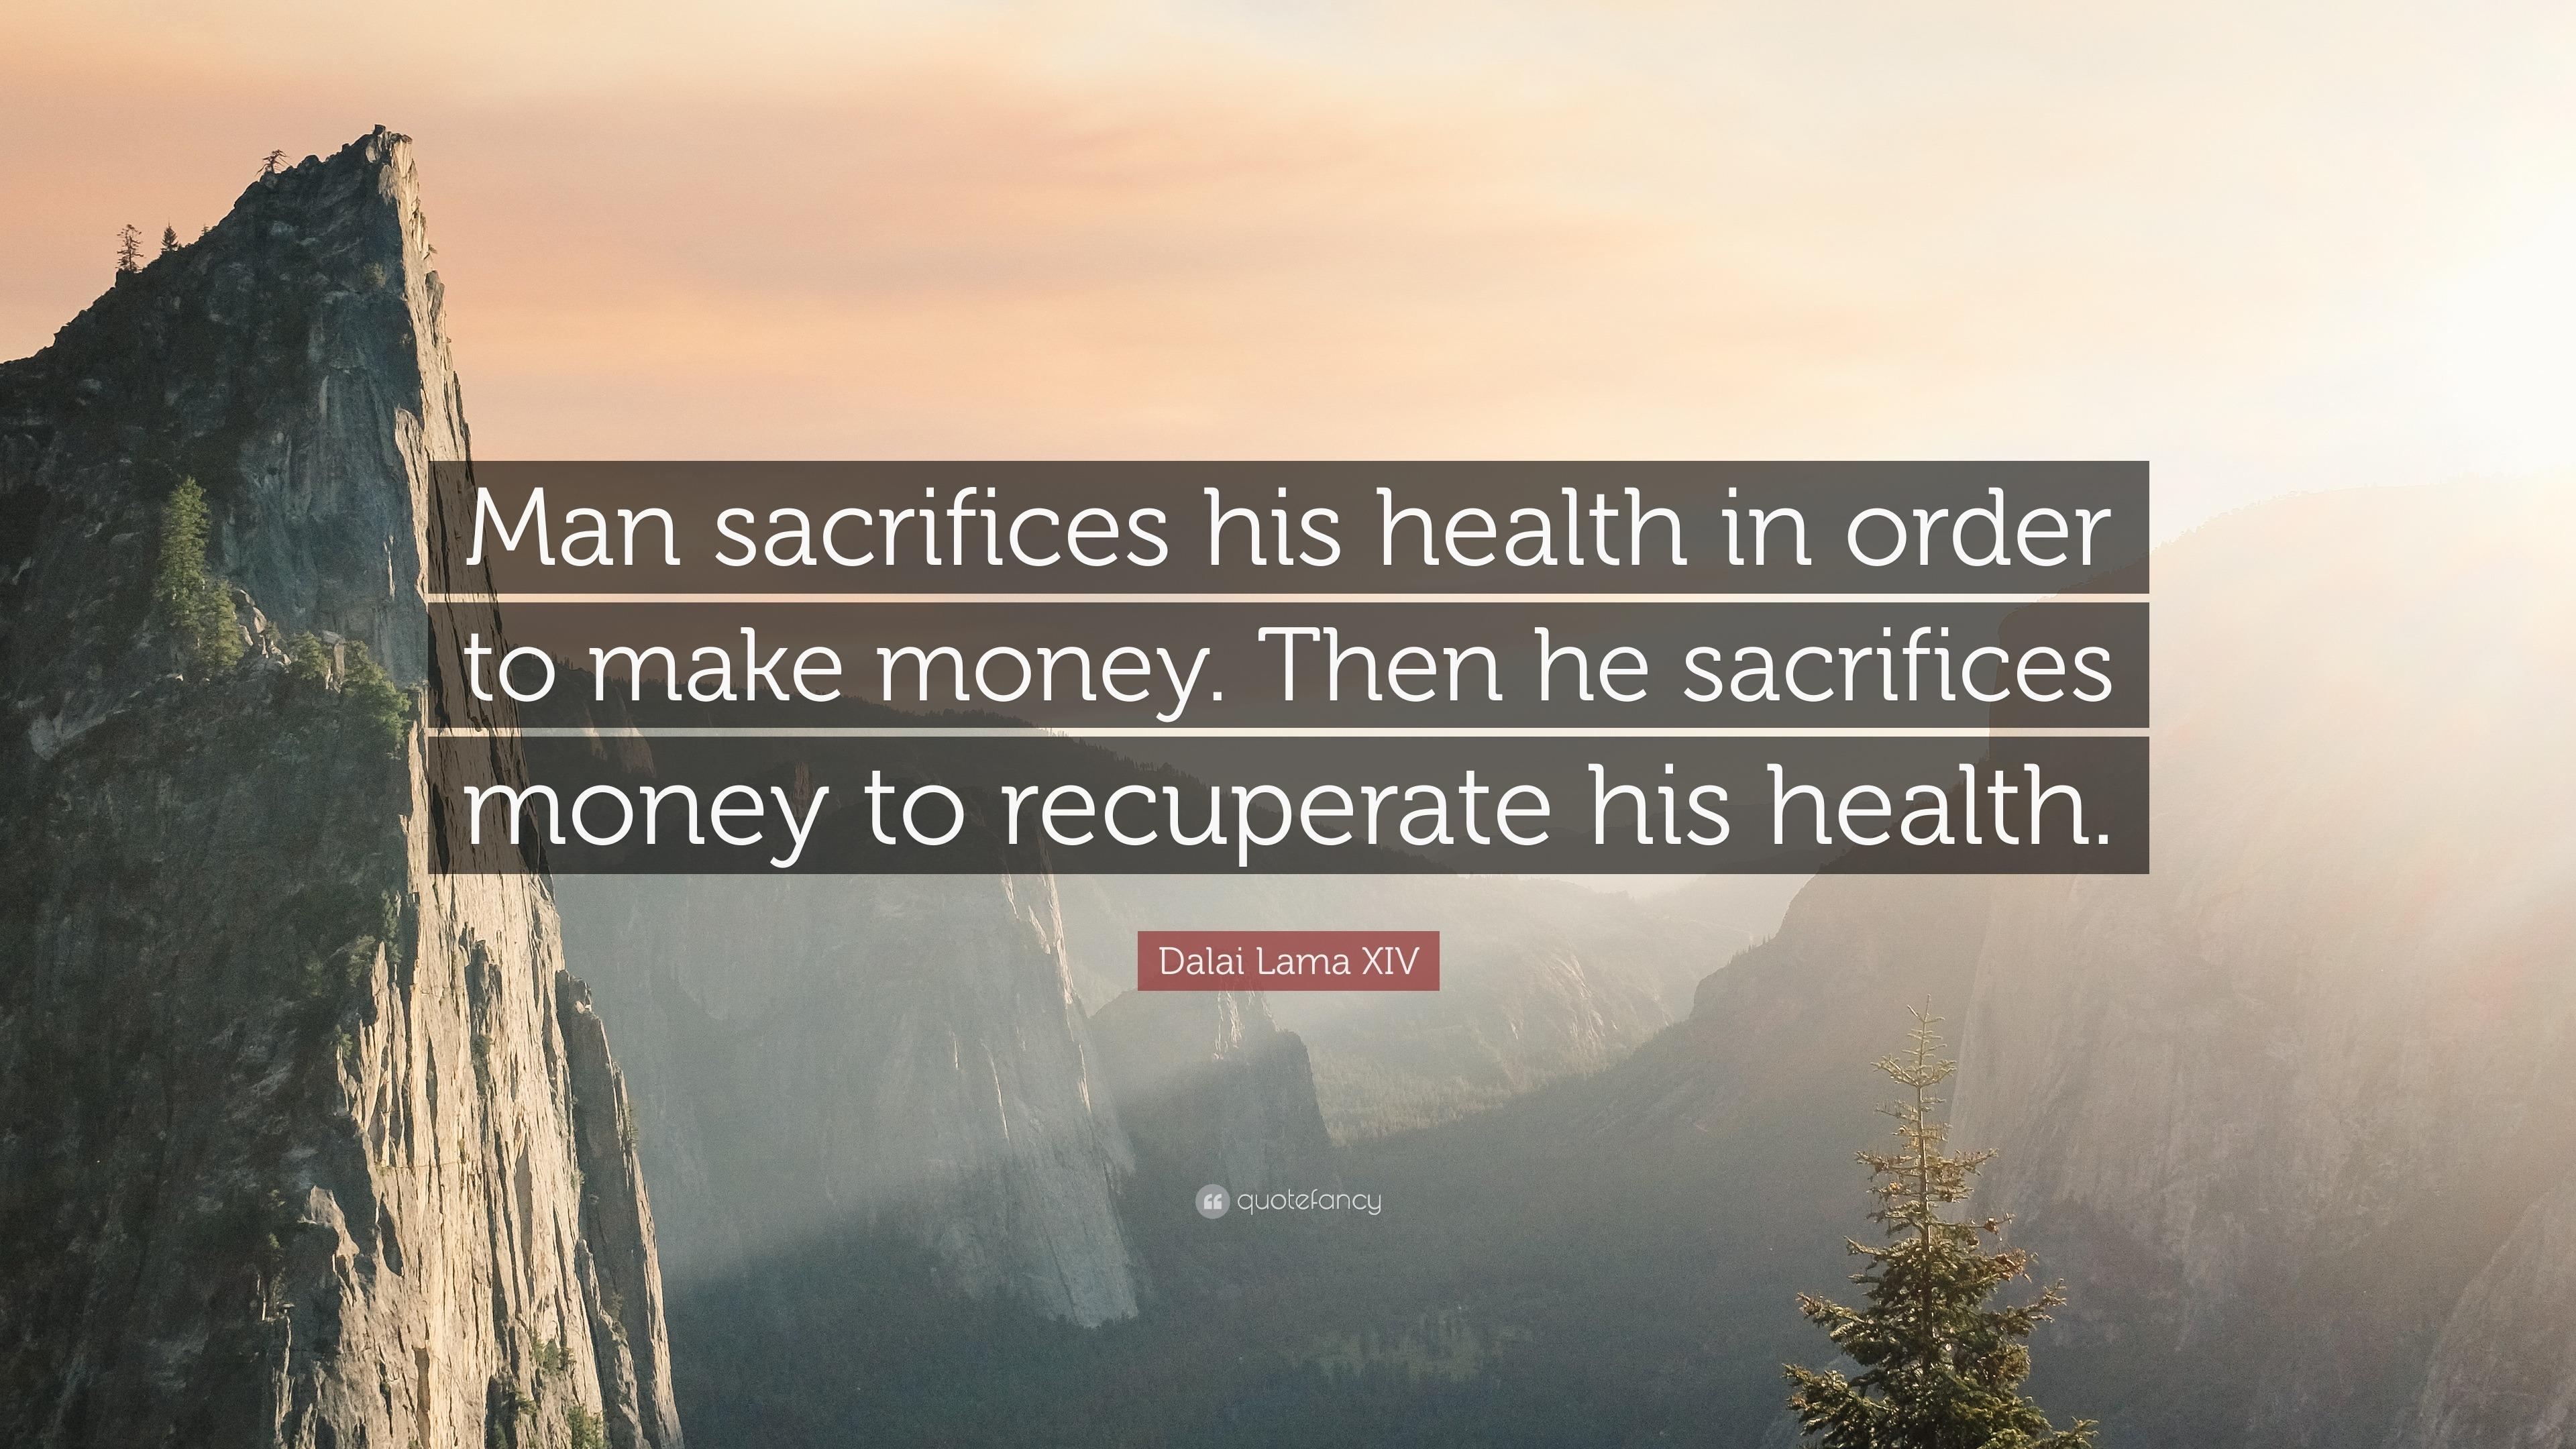 Dalai Lama Xiv Quote Man Sacrifices His Health In Order To Make